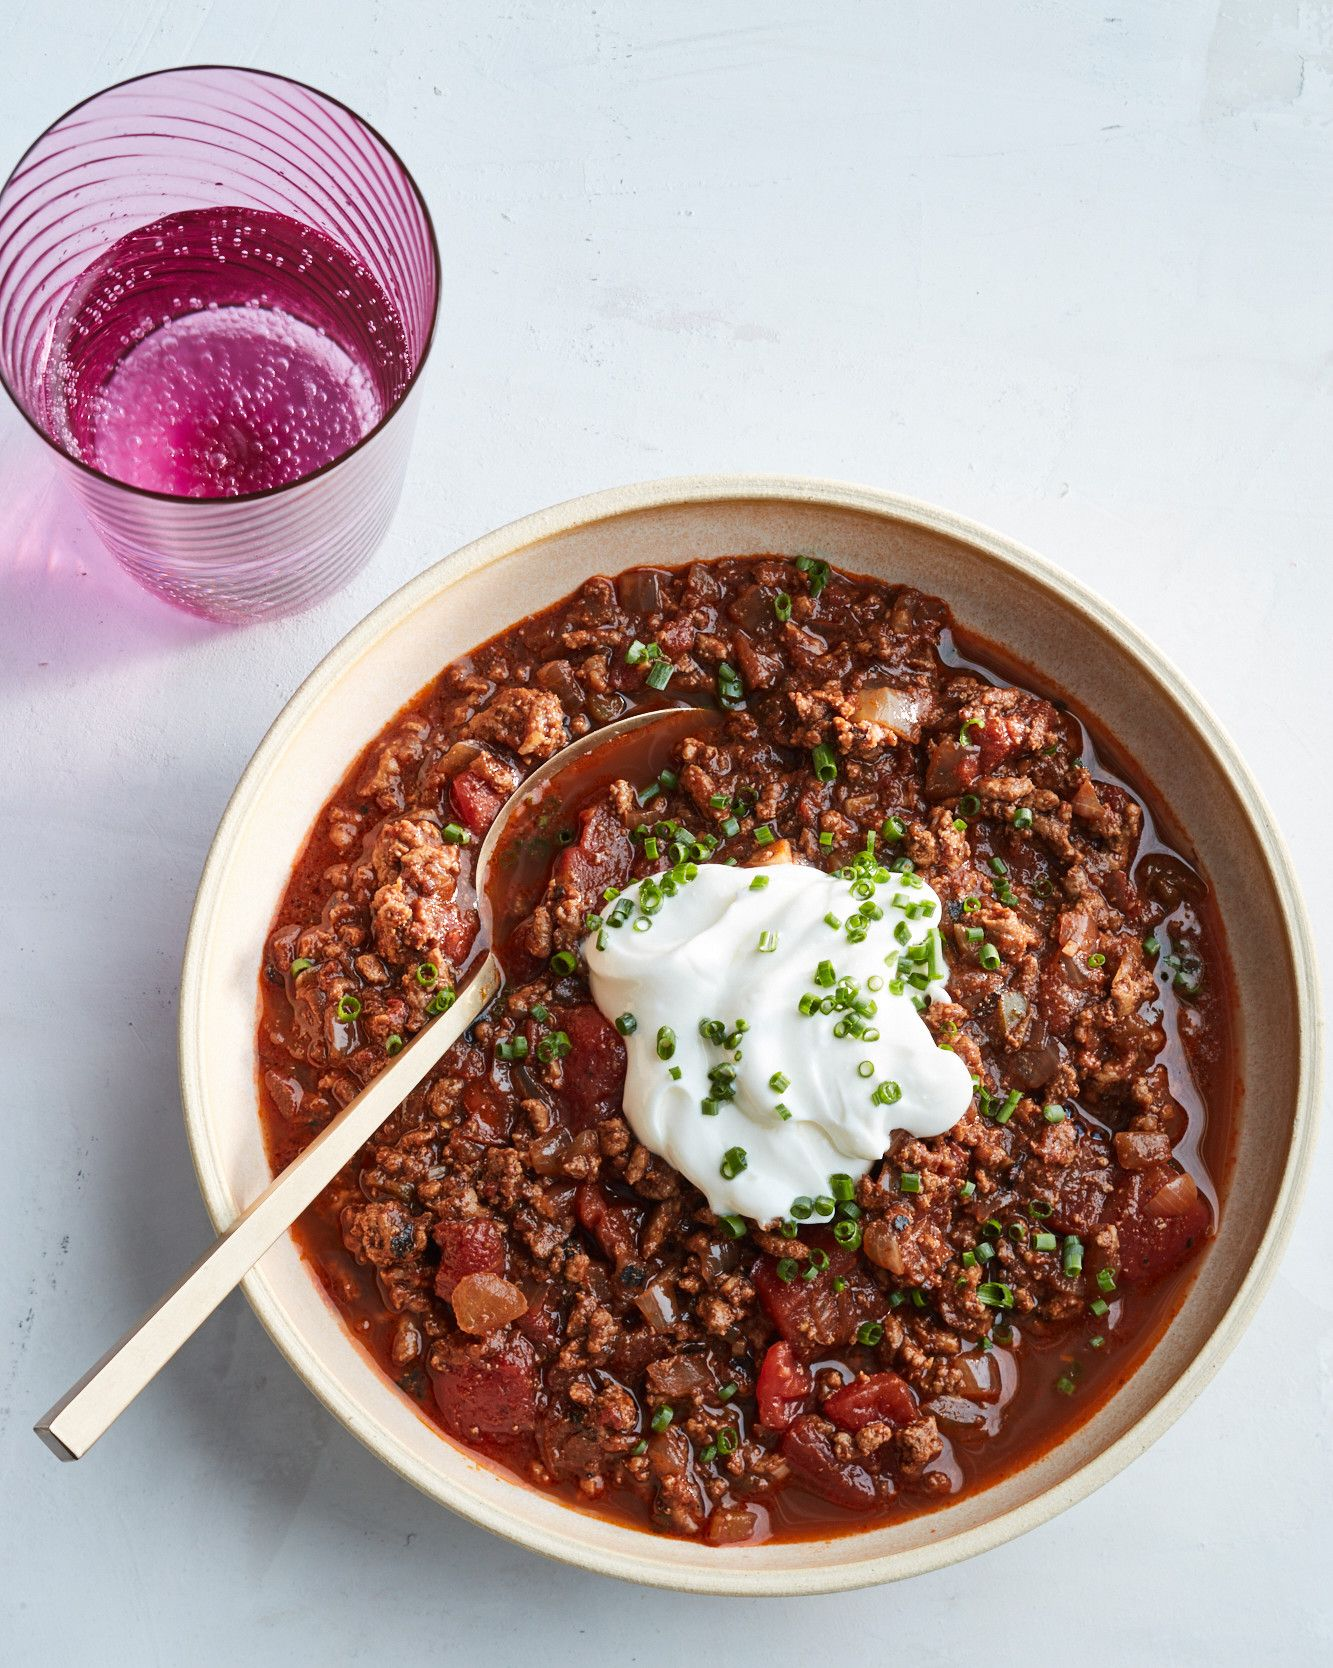 Easy Beef Chili Recipe Recipe Beef Chili Recipe Easy Beef Chili Recipe Beef Chili